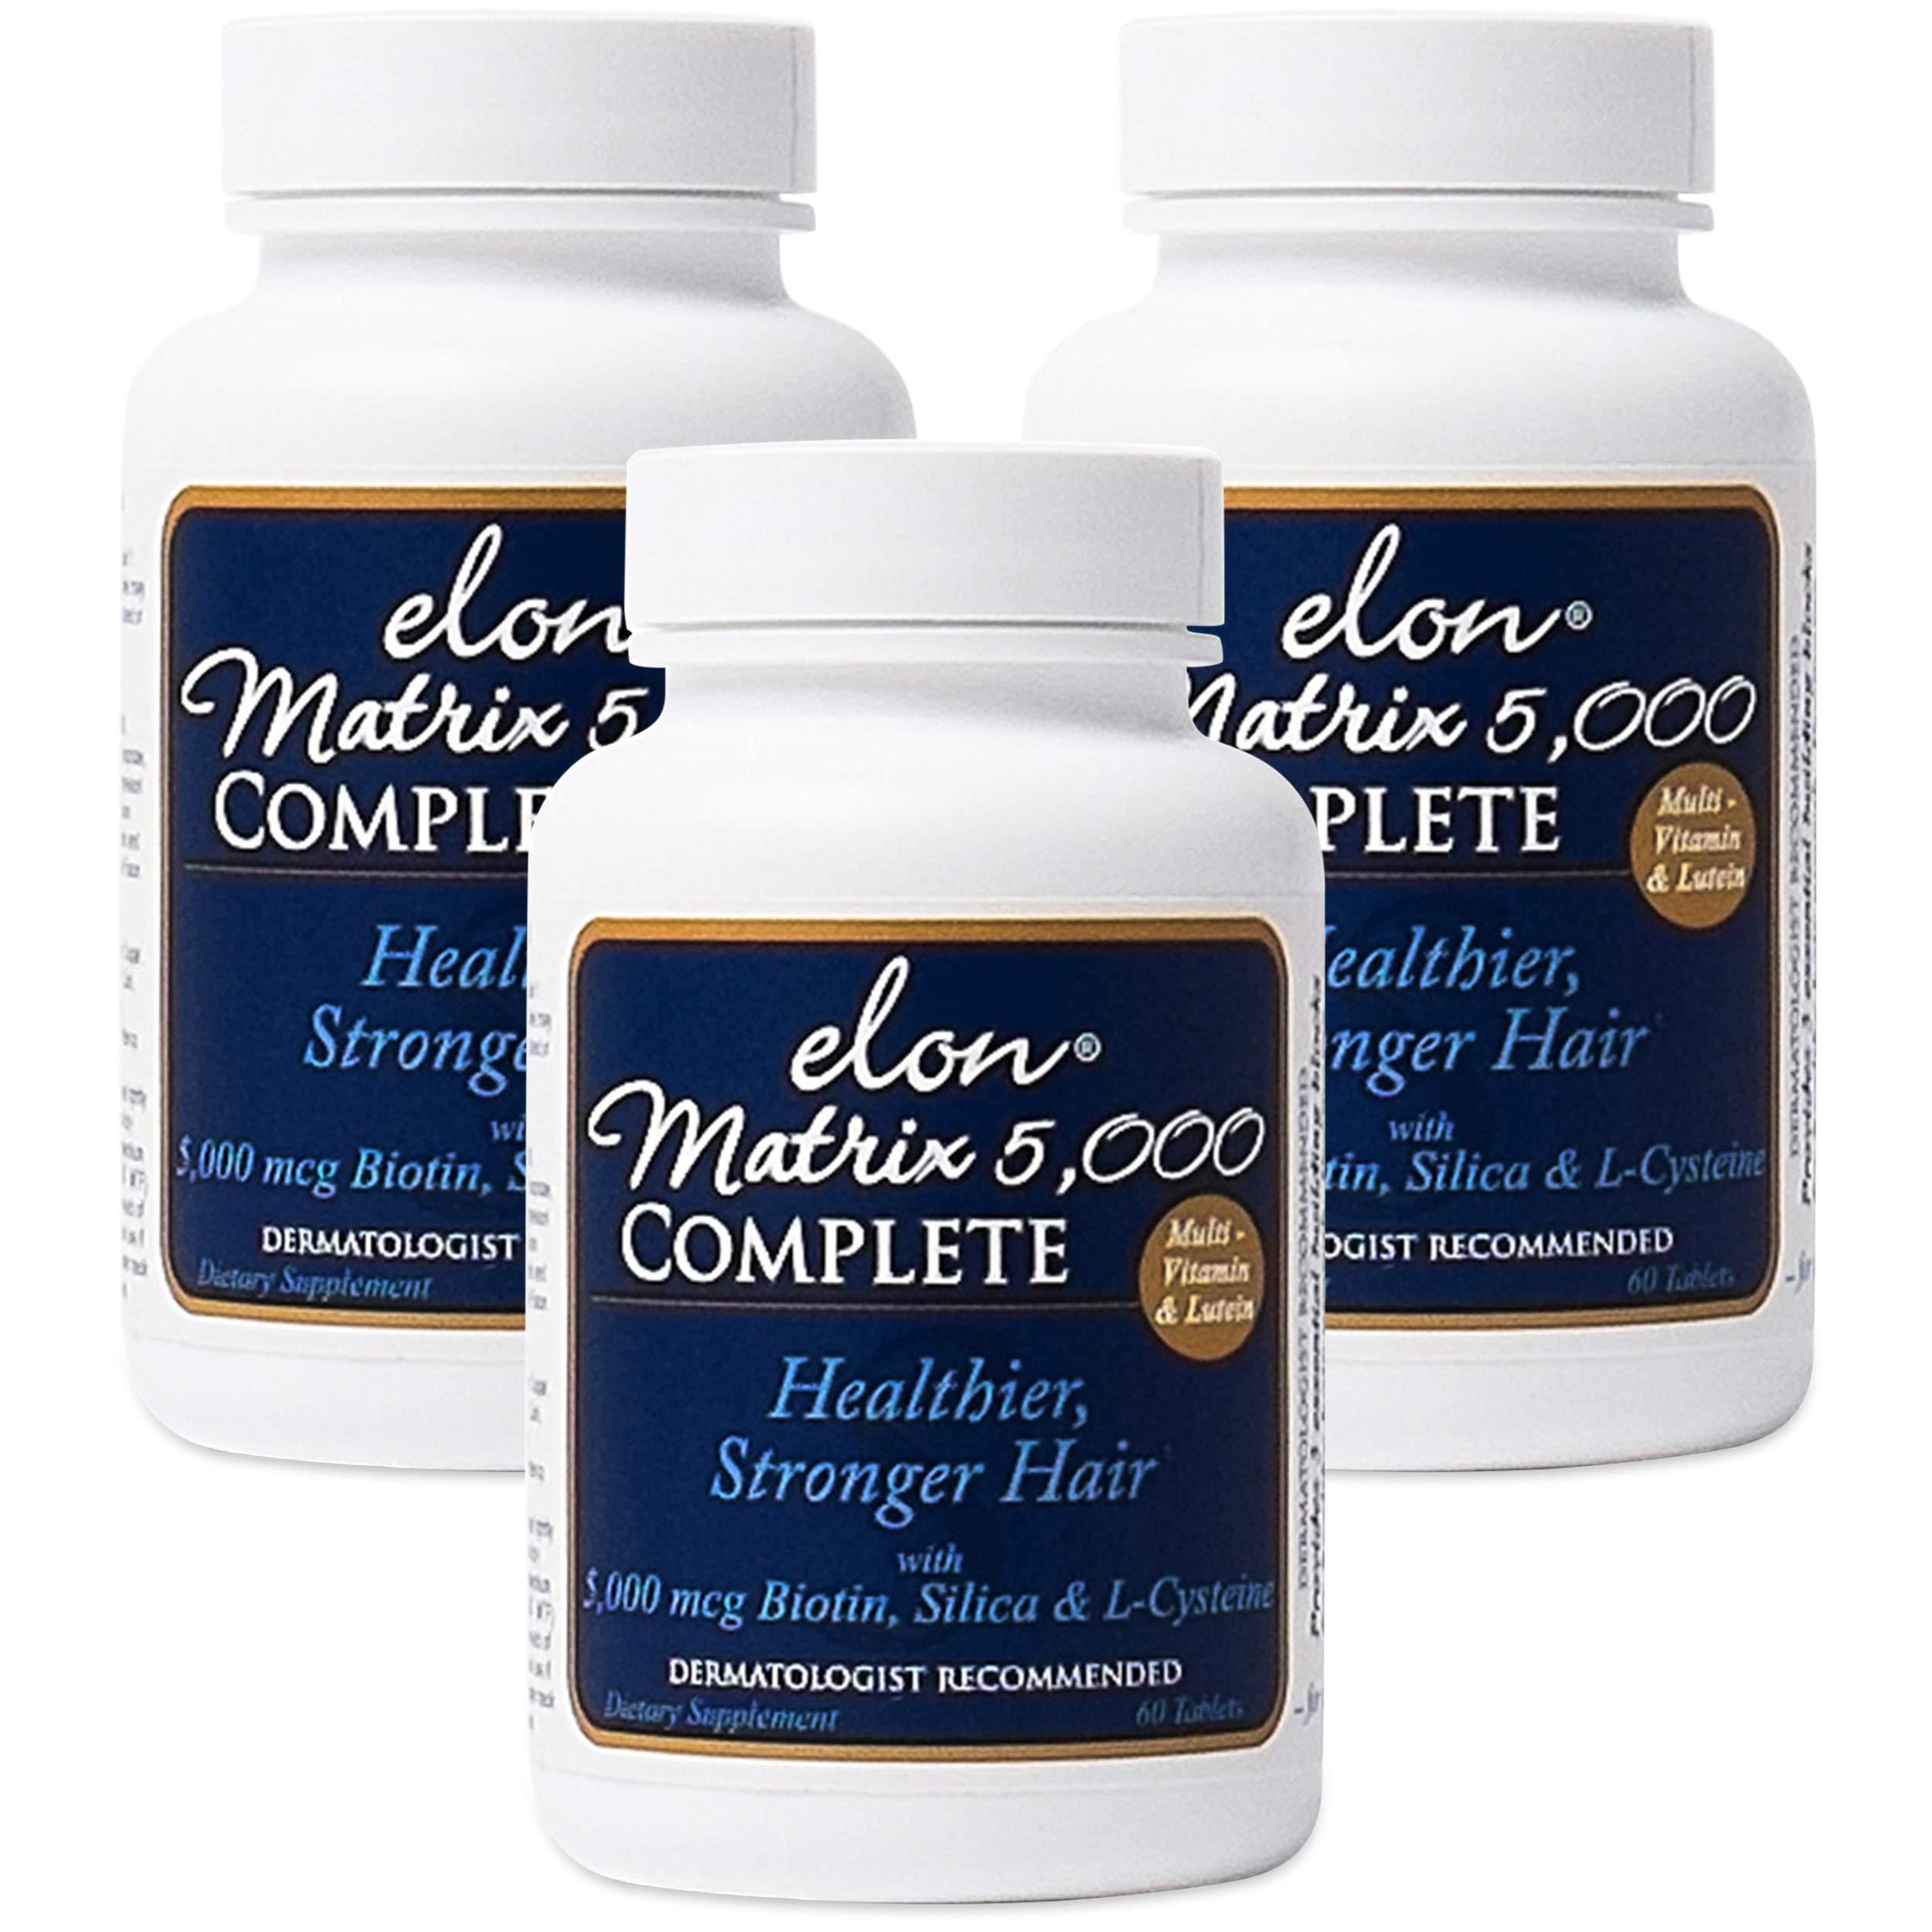 Elon Matrix 5,000 Complete Multi-Vitamin for Hair - 3 Pack